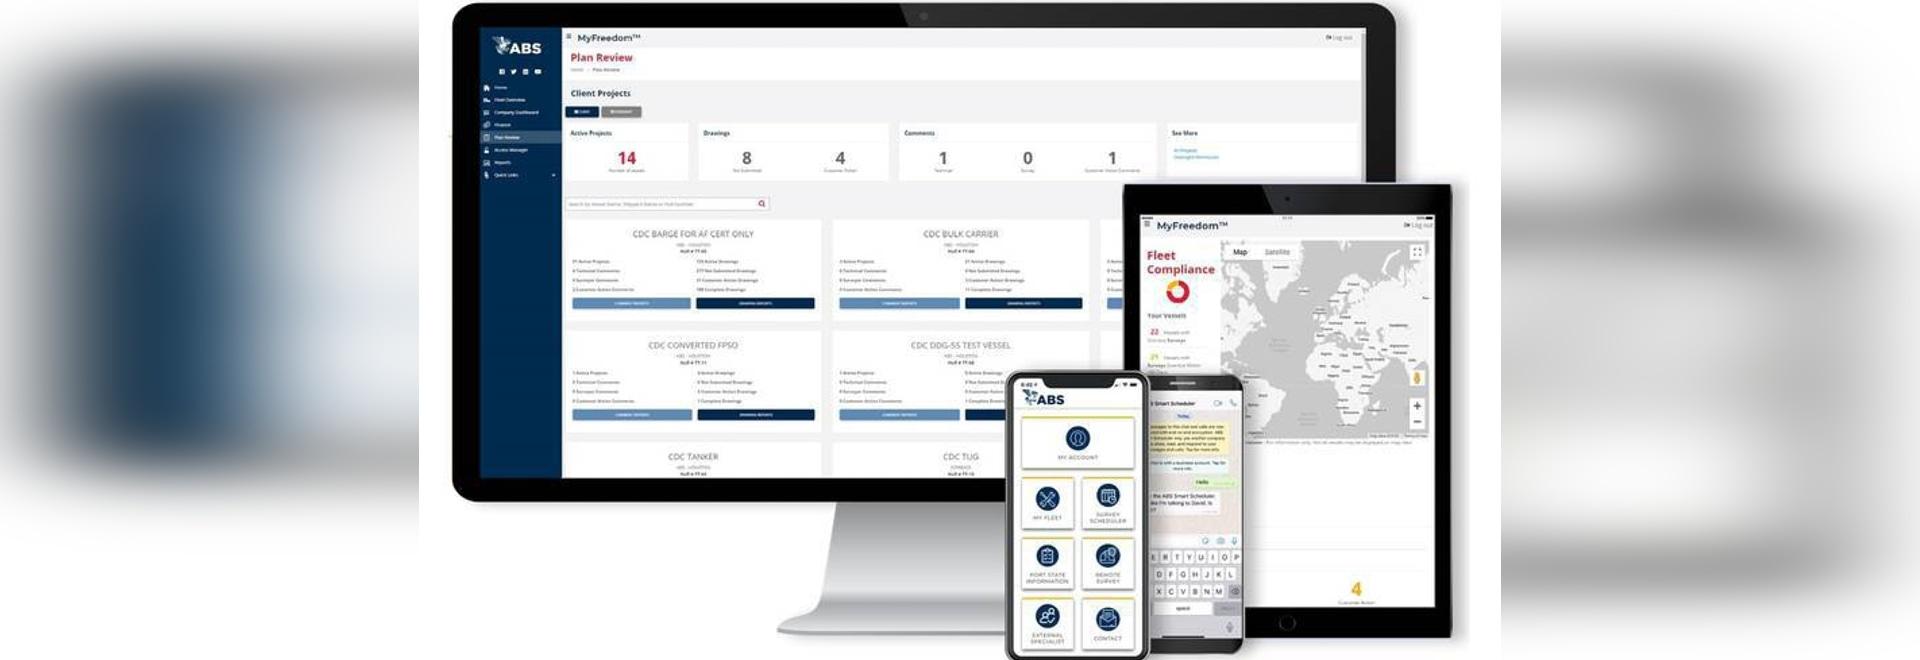 ABS macht intelligente Klassendienste mobil